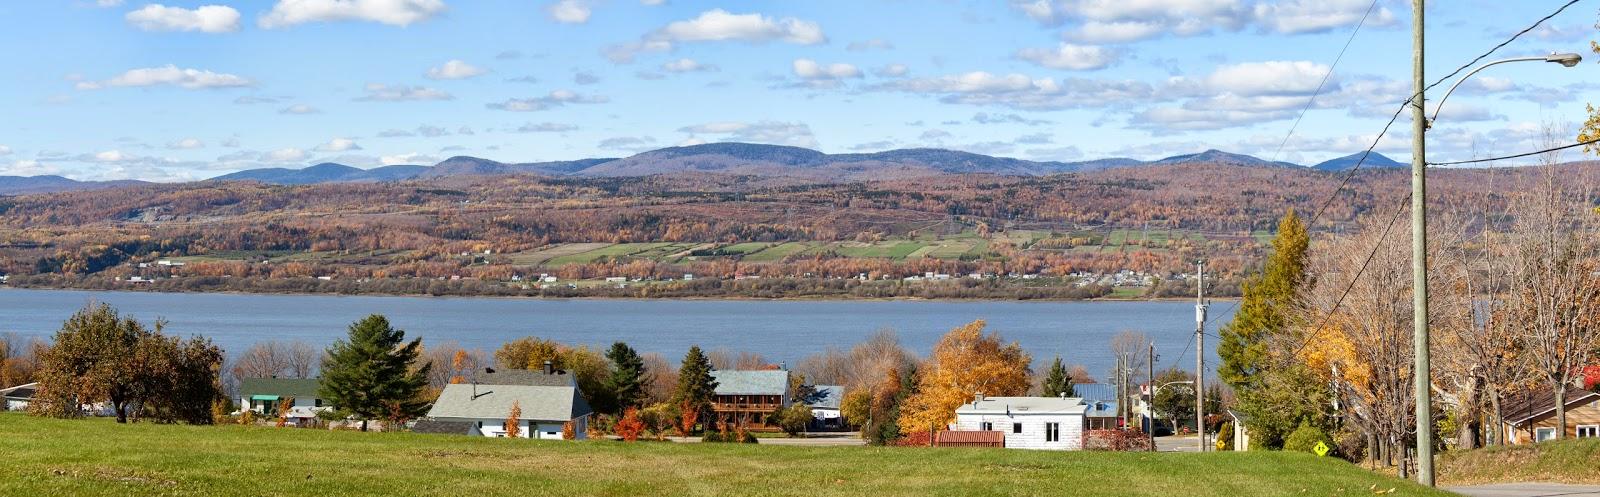 Ste-Famille on Ile d'Orléans in Quebec